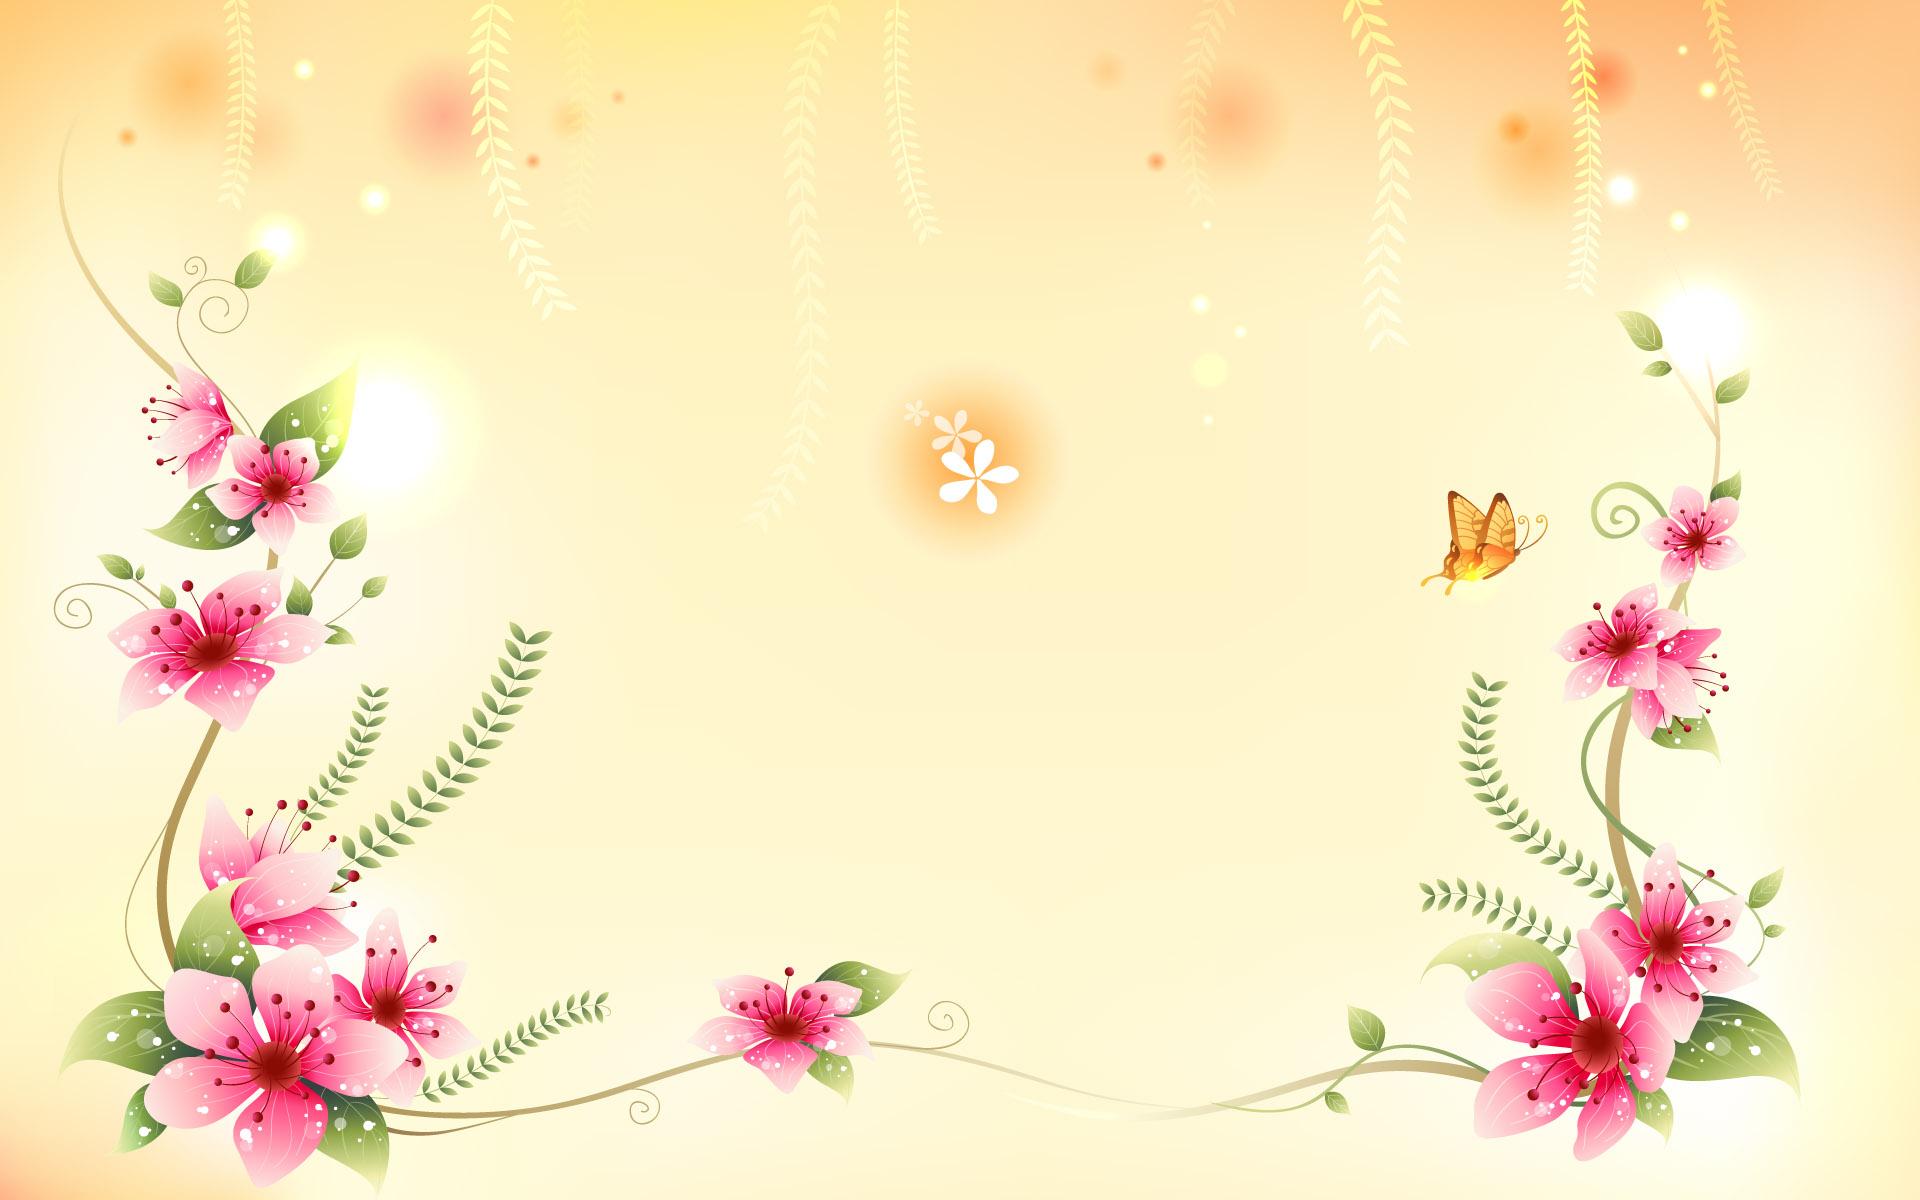 Flower Wallpaper Designs Wallpapers High Definition Abstract Src